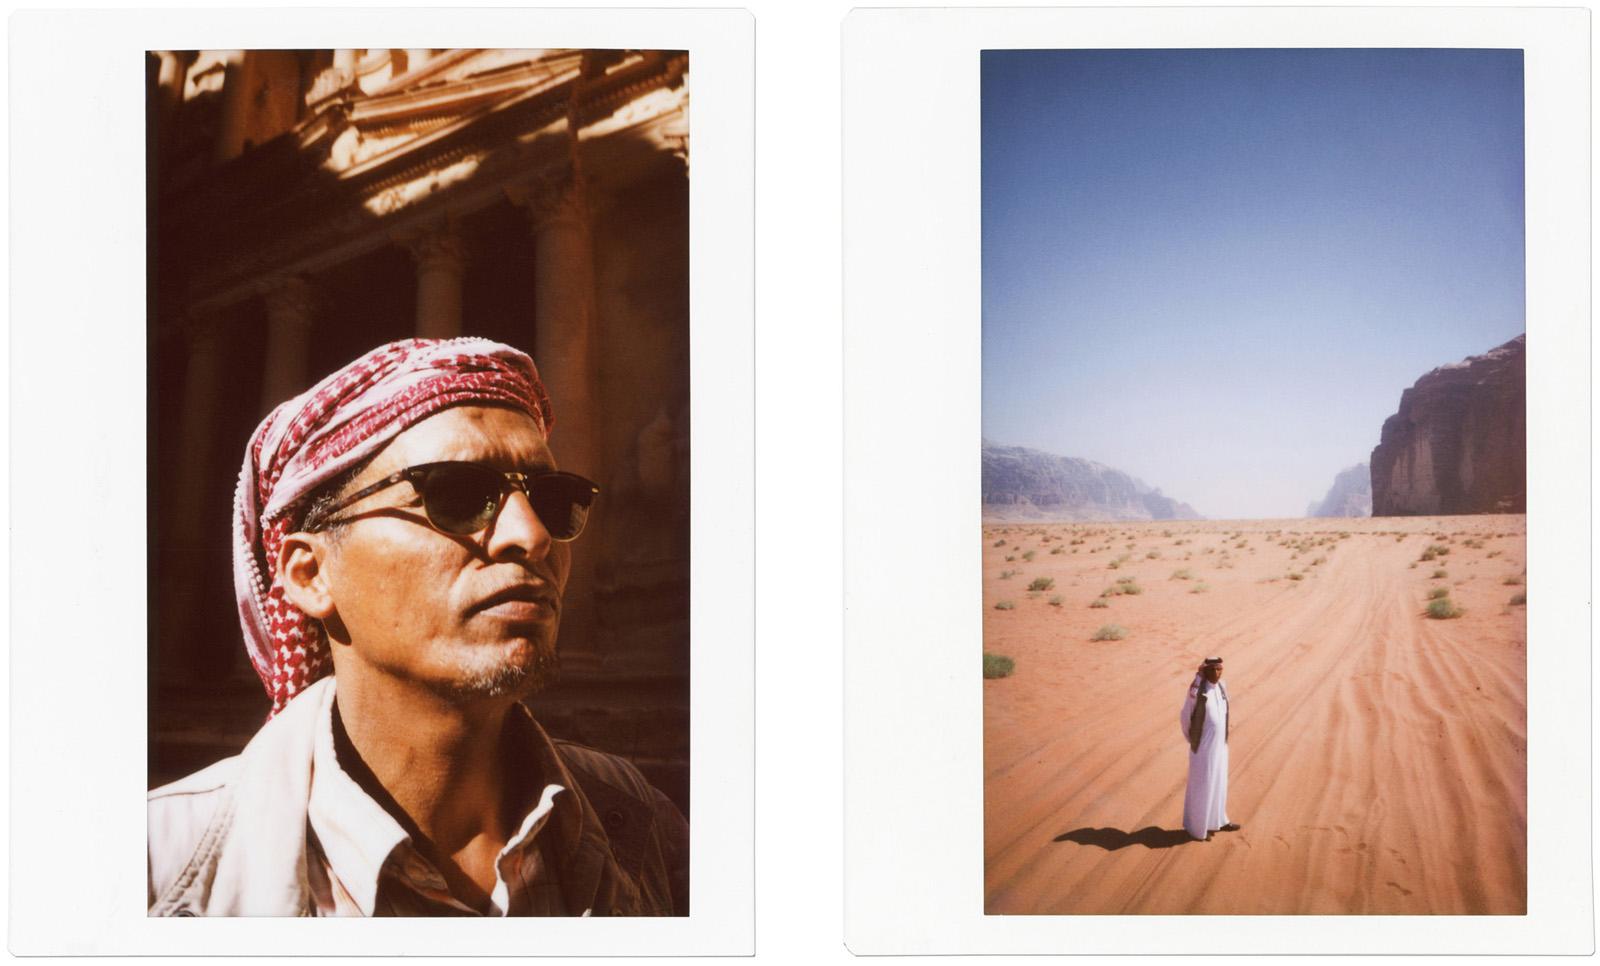 Bedouin, Juomaa Koupilan, Jordan